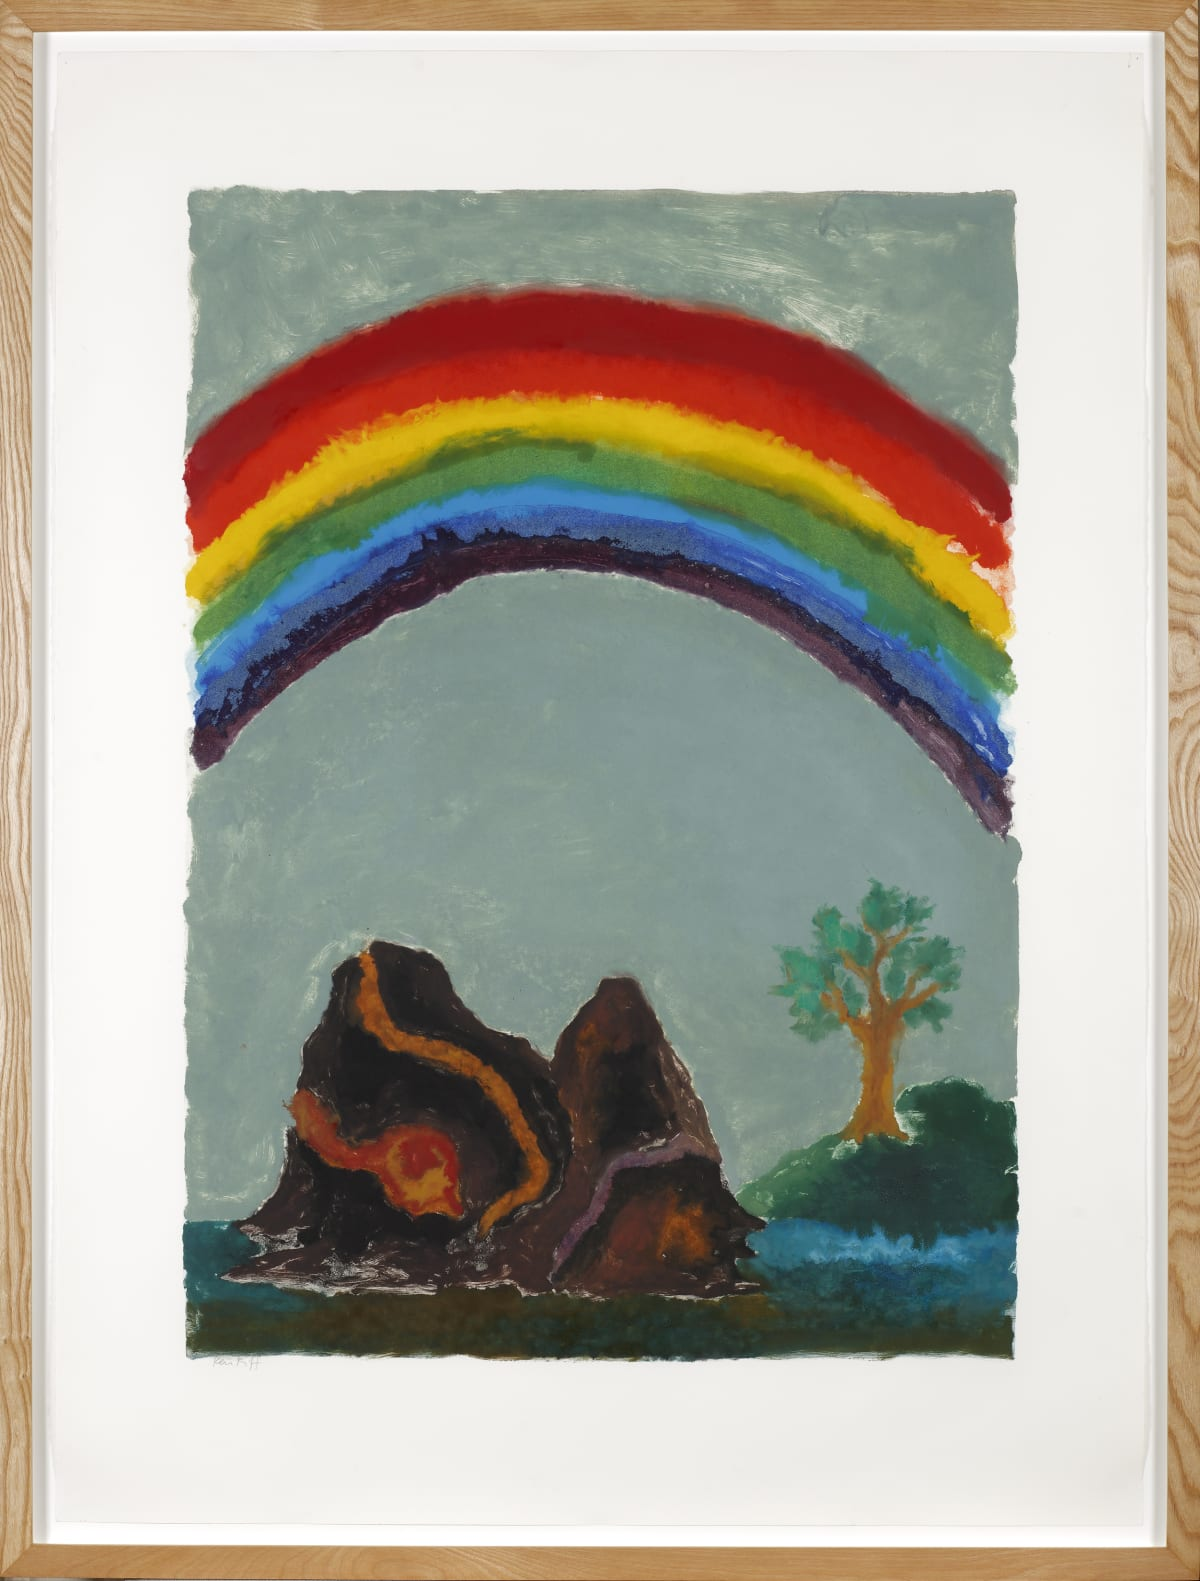 Ken Kiff Bright Rainbow, Tree and Hills (A1m), 1989, monotype, 1989 Monotype